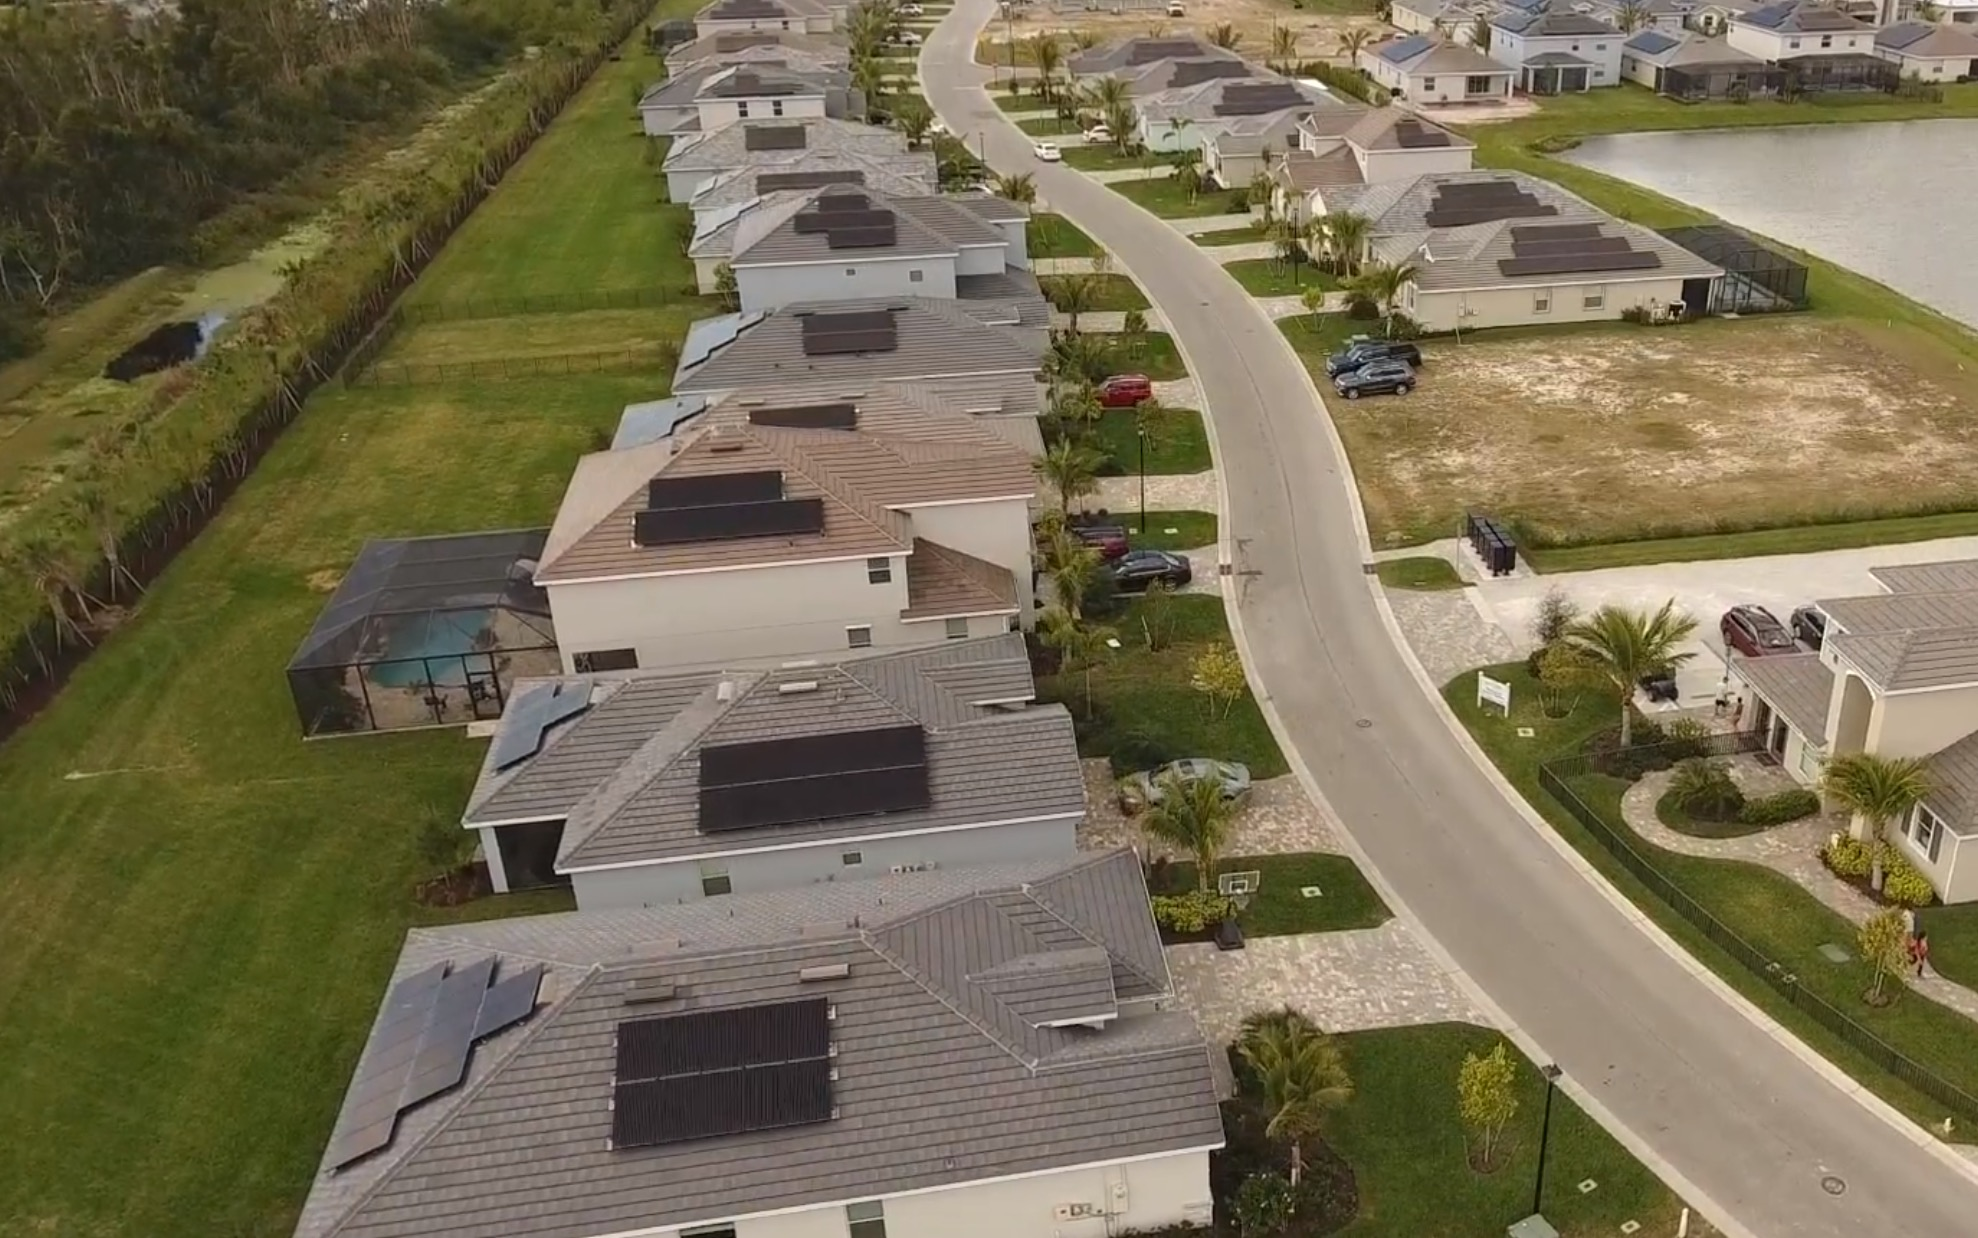 Should I Buy Solar Panels From My Builder? - Florida Solar